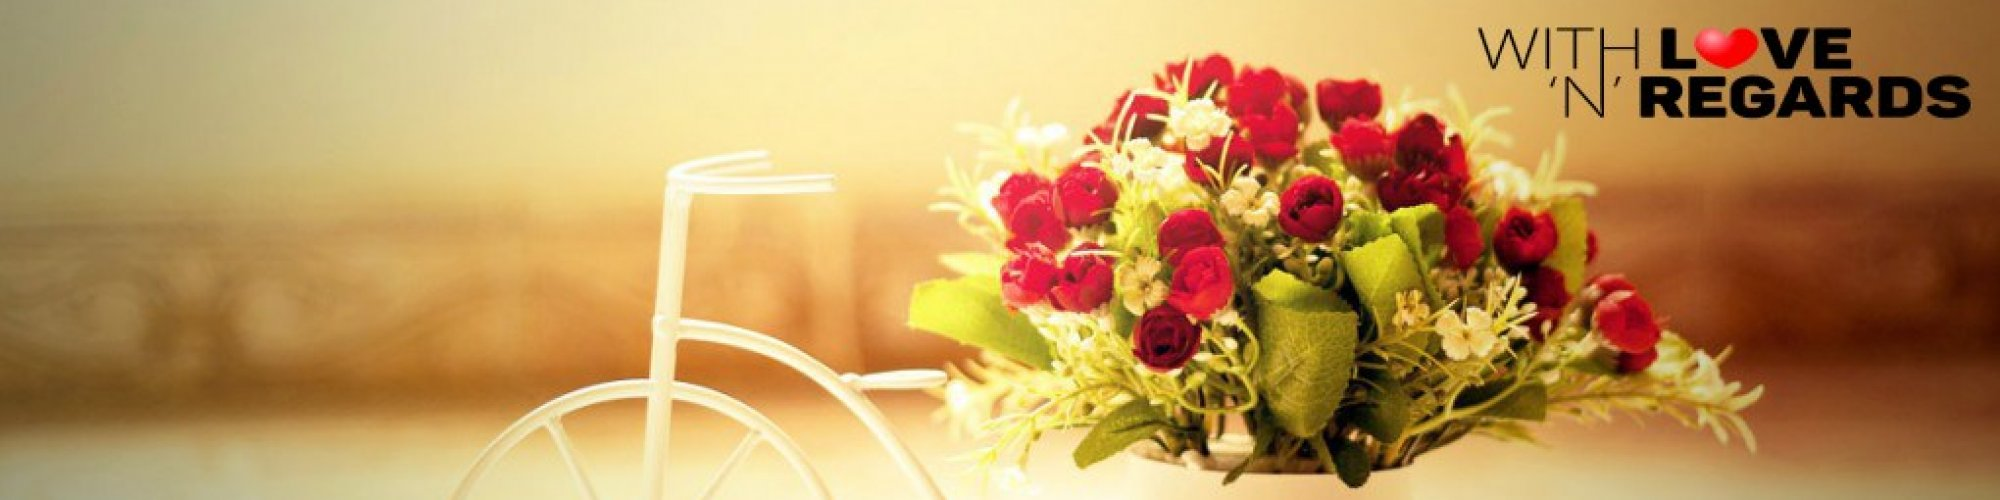 Withlovenregards - Online Flower Delivery in pune